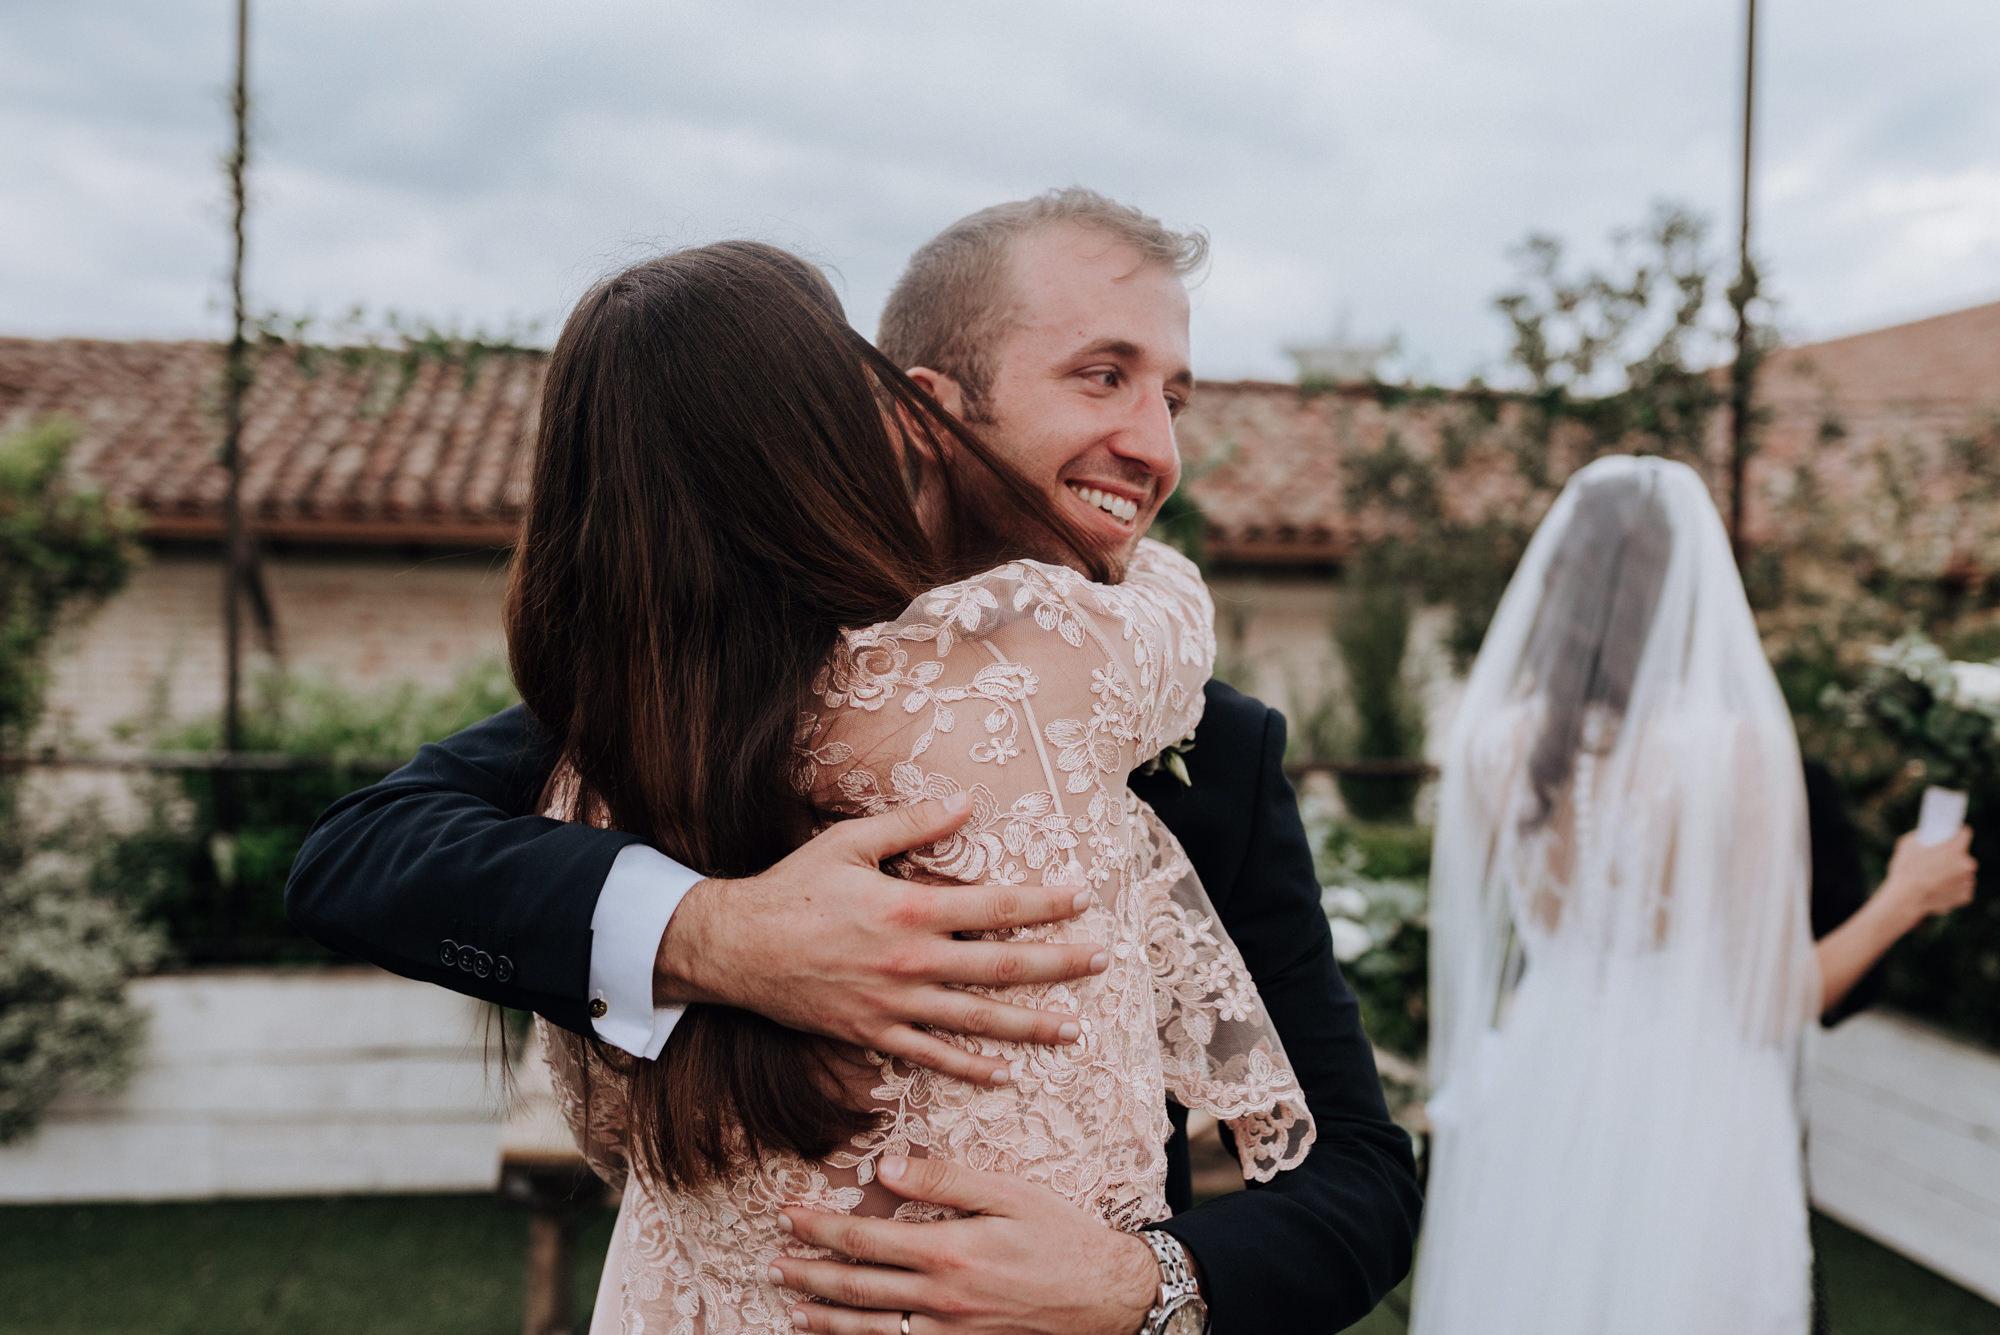 FOTO+PHOTO+BODA+WEDDING+ITALIA+ITALY+MAURICIO+GARAY+MAURICIOGARAY+WEDDINPHOTOGRAPHER+FOTOGRAFODEBODA-1516.jpg